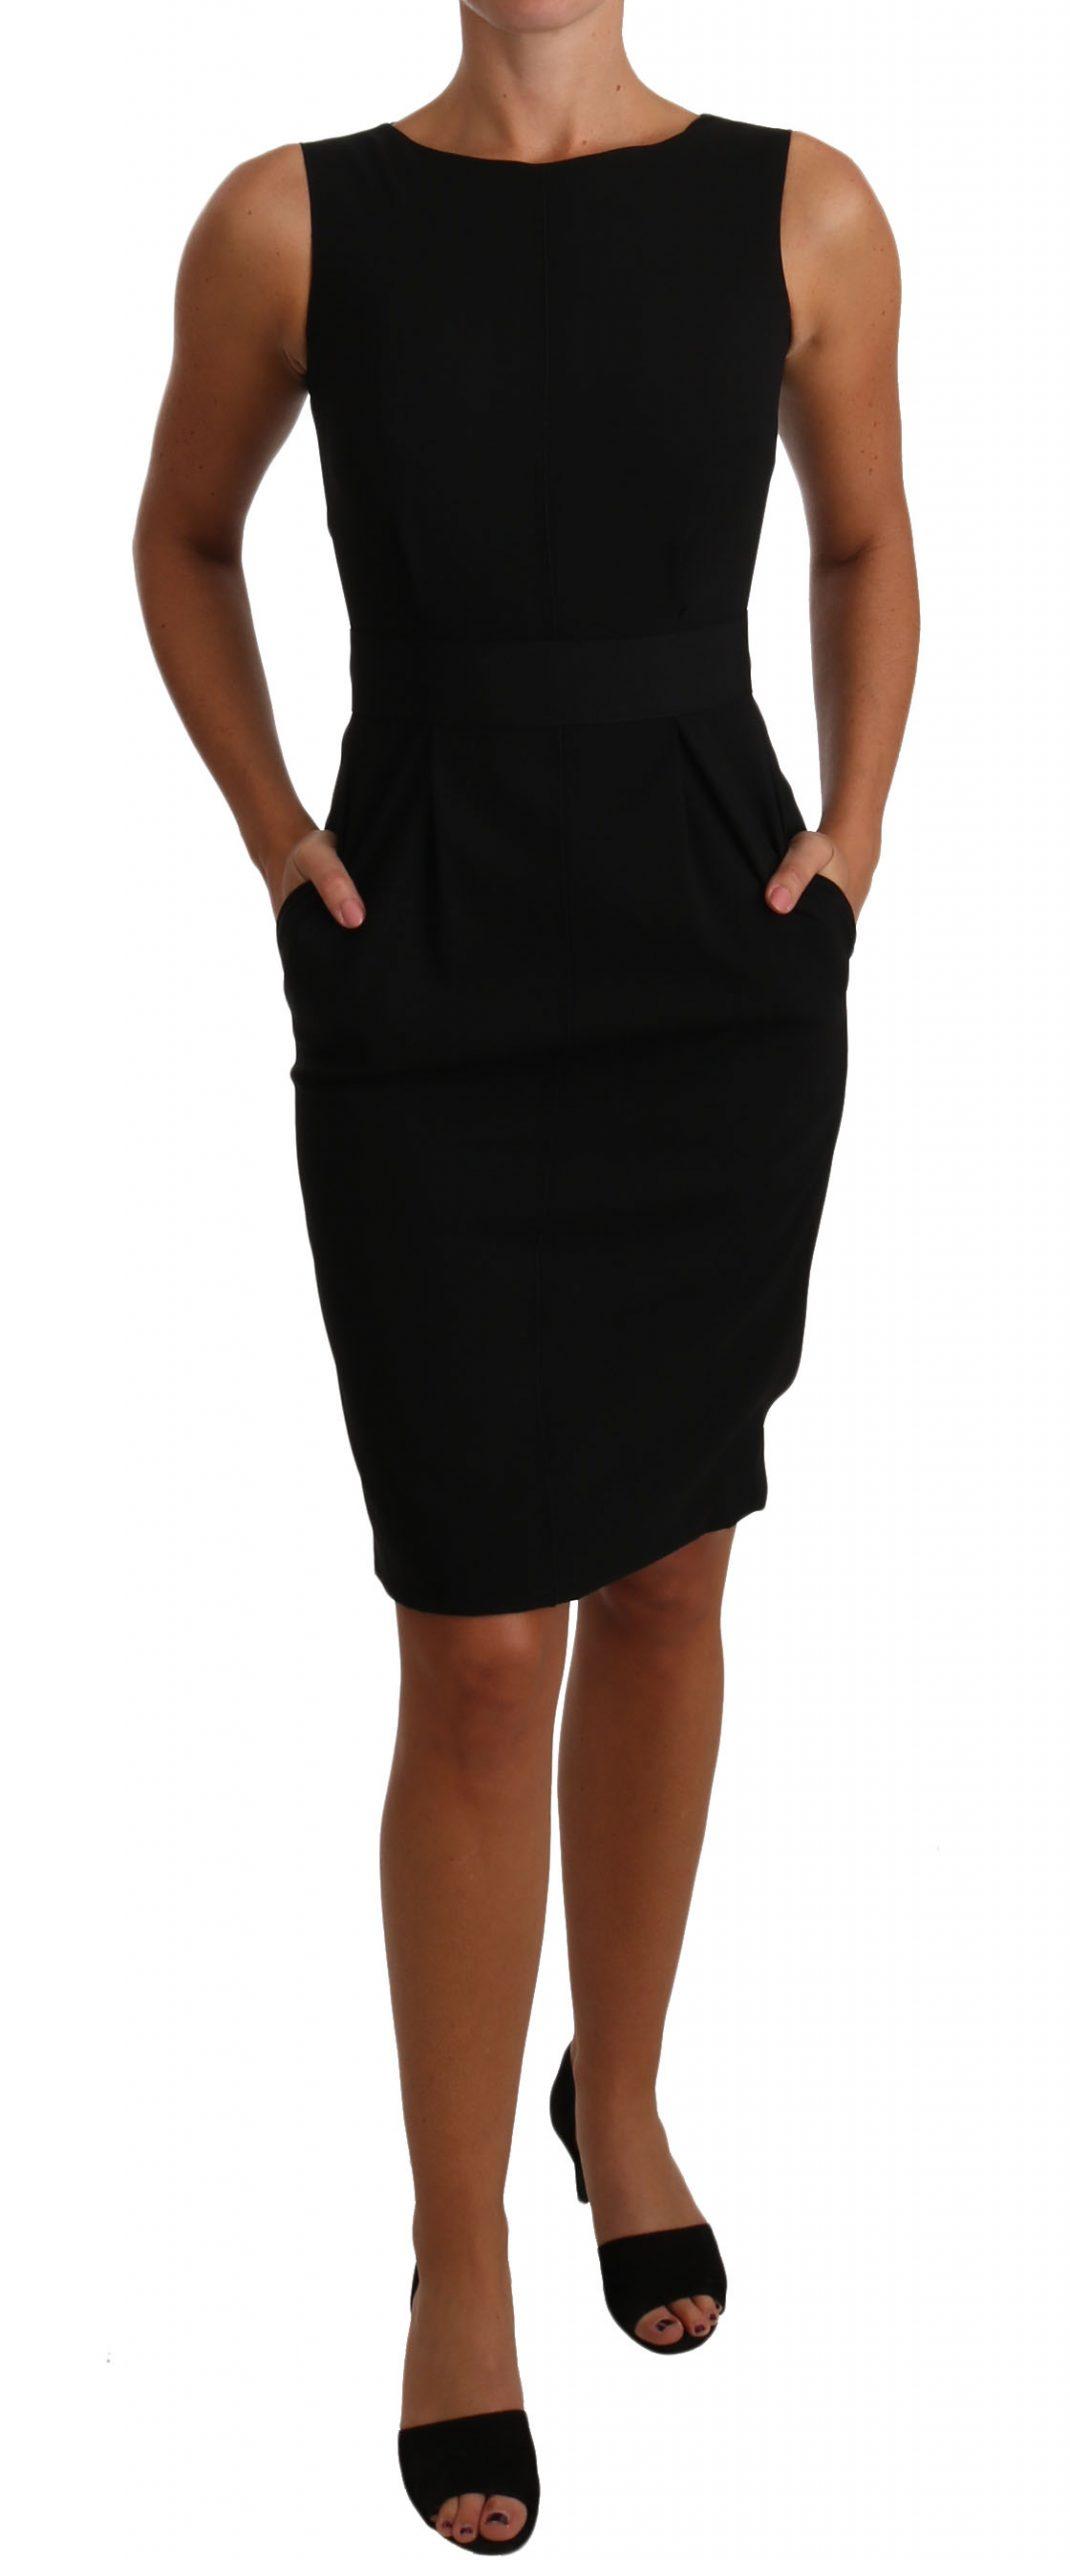 Dolce & Gabbana Women's Coctail Pencil Sheath Dress Black DR1424 - IT36 XXS